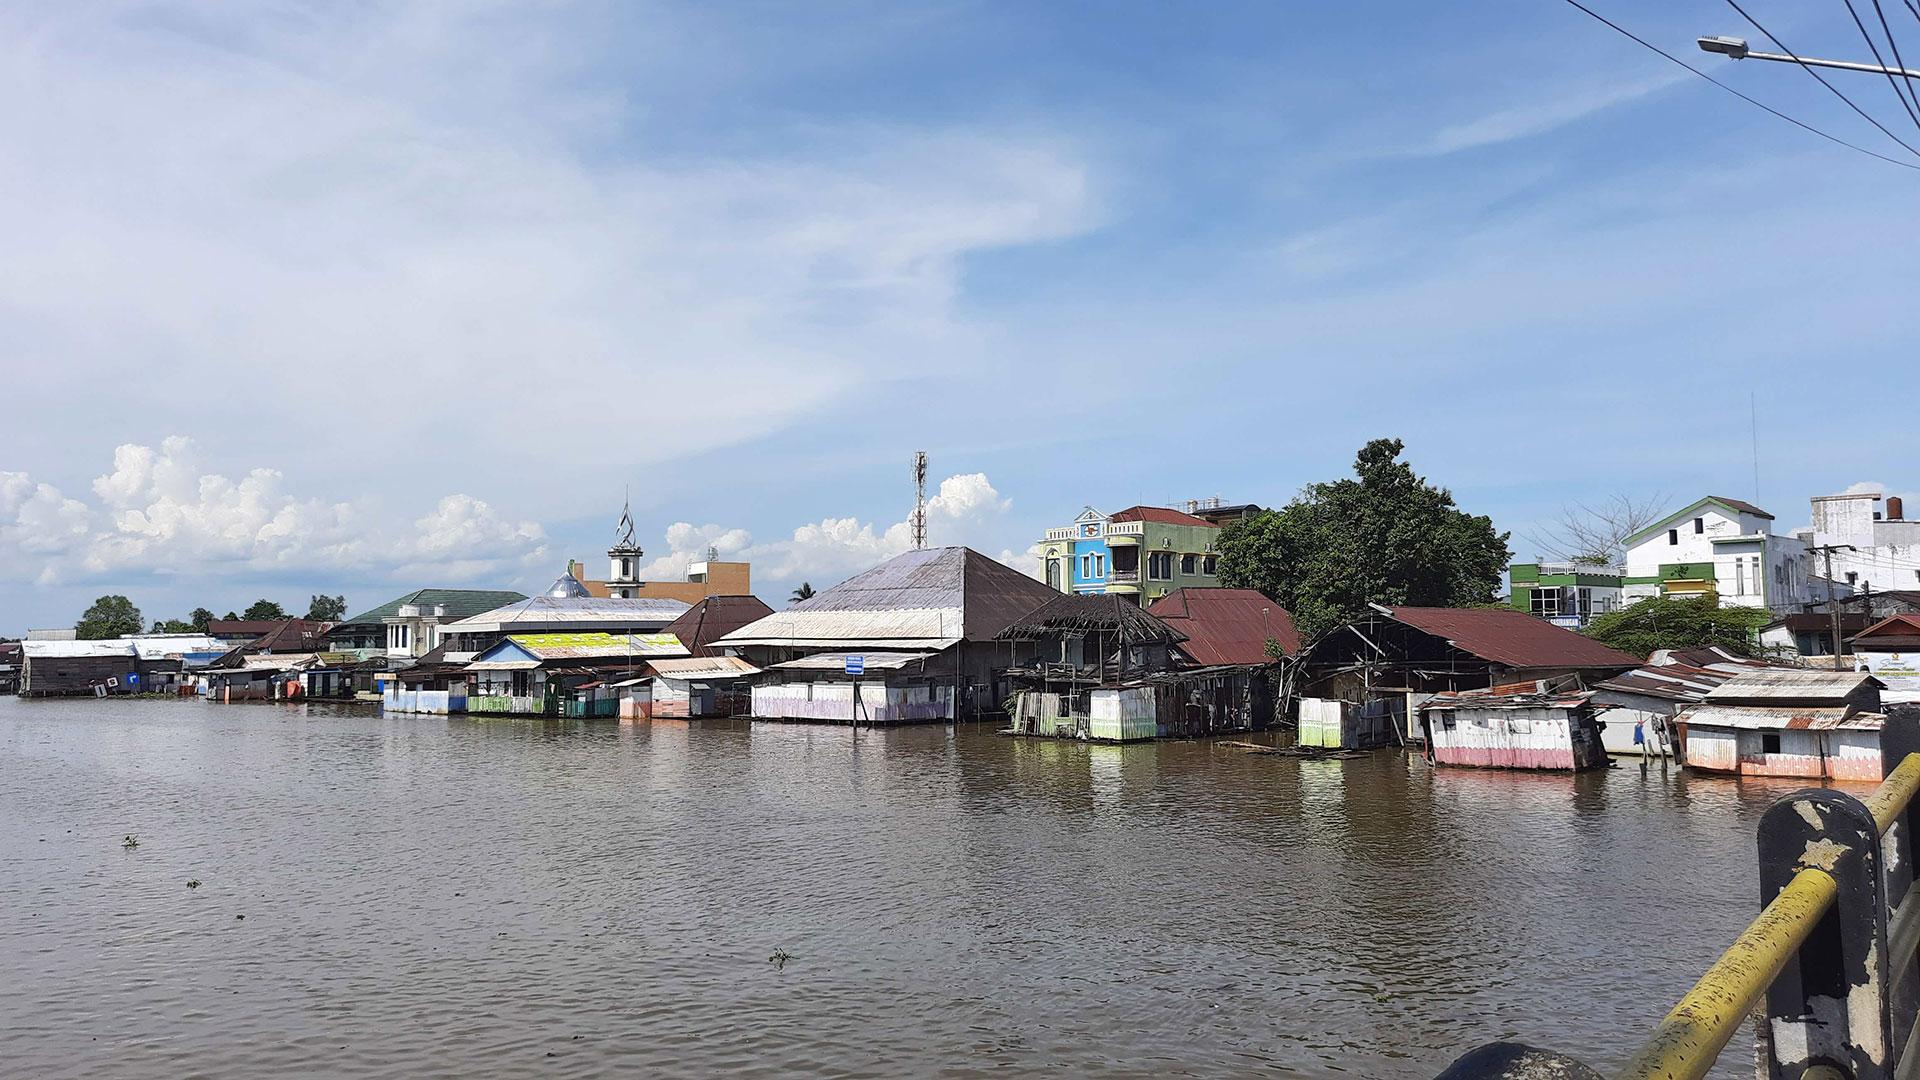 tita-salina-irwan-ahmett-jakarta-rizki-mailindasari-martapura-river-south-kalimantan